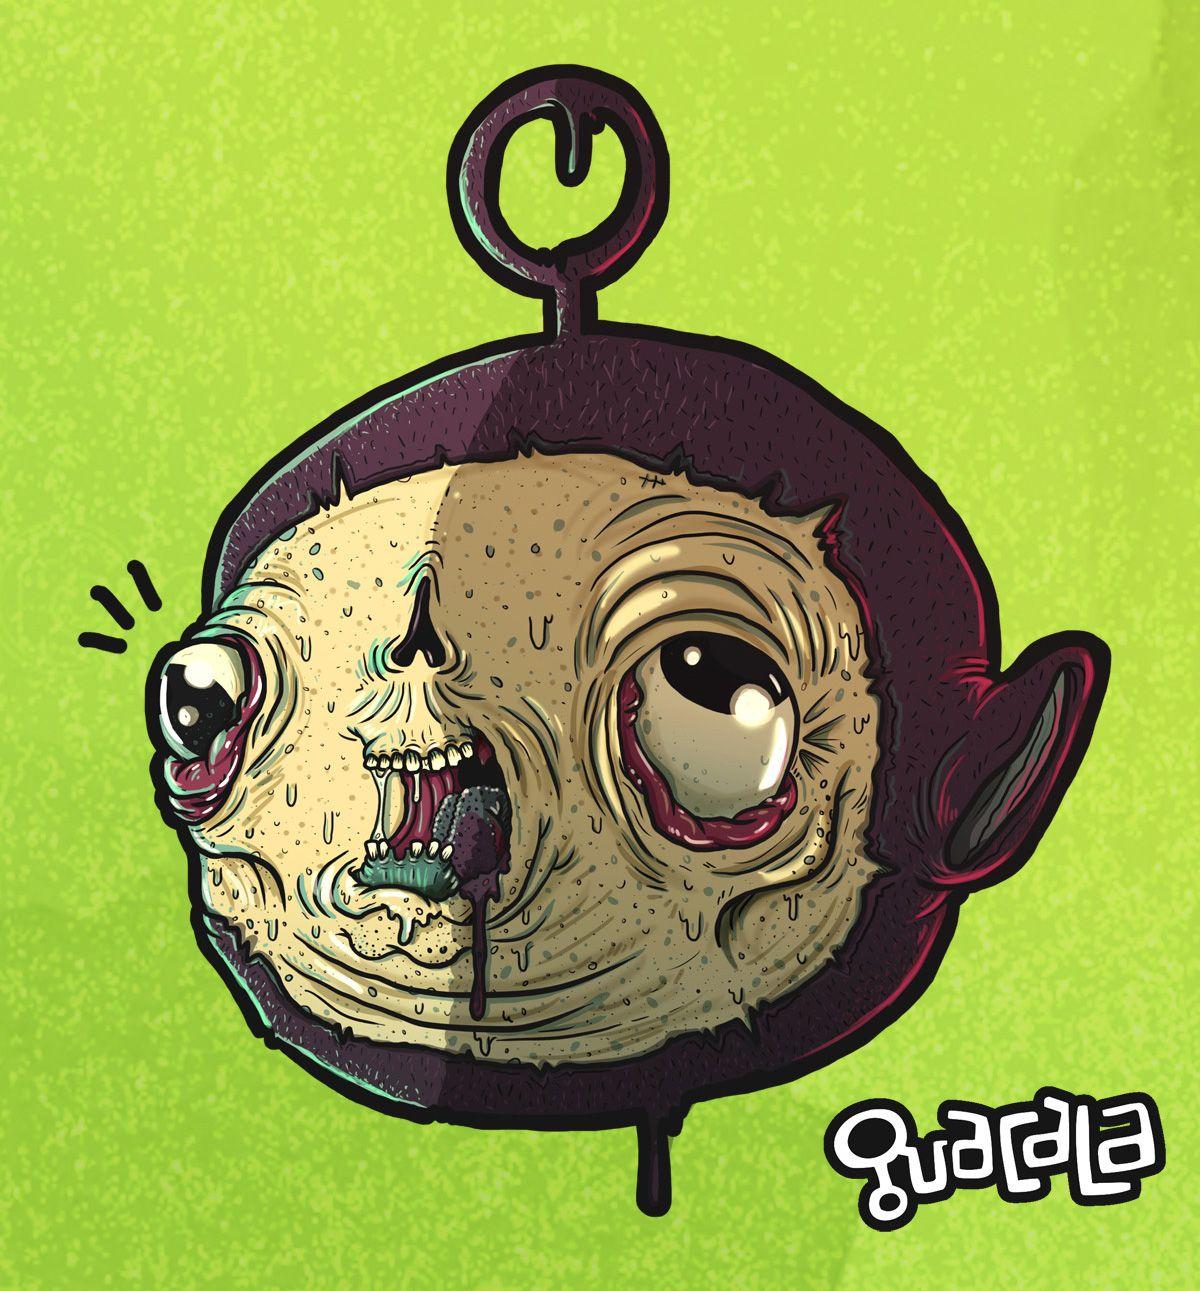 Fan Art /// teletubbies //// Ilustracion digital /// Colectivo ...